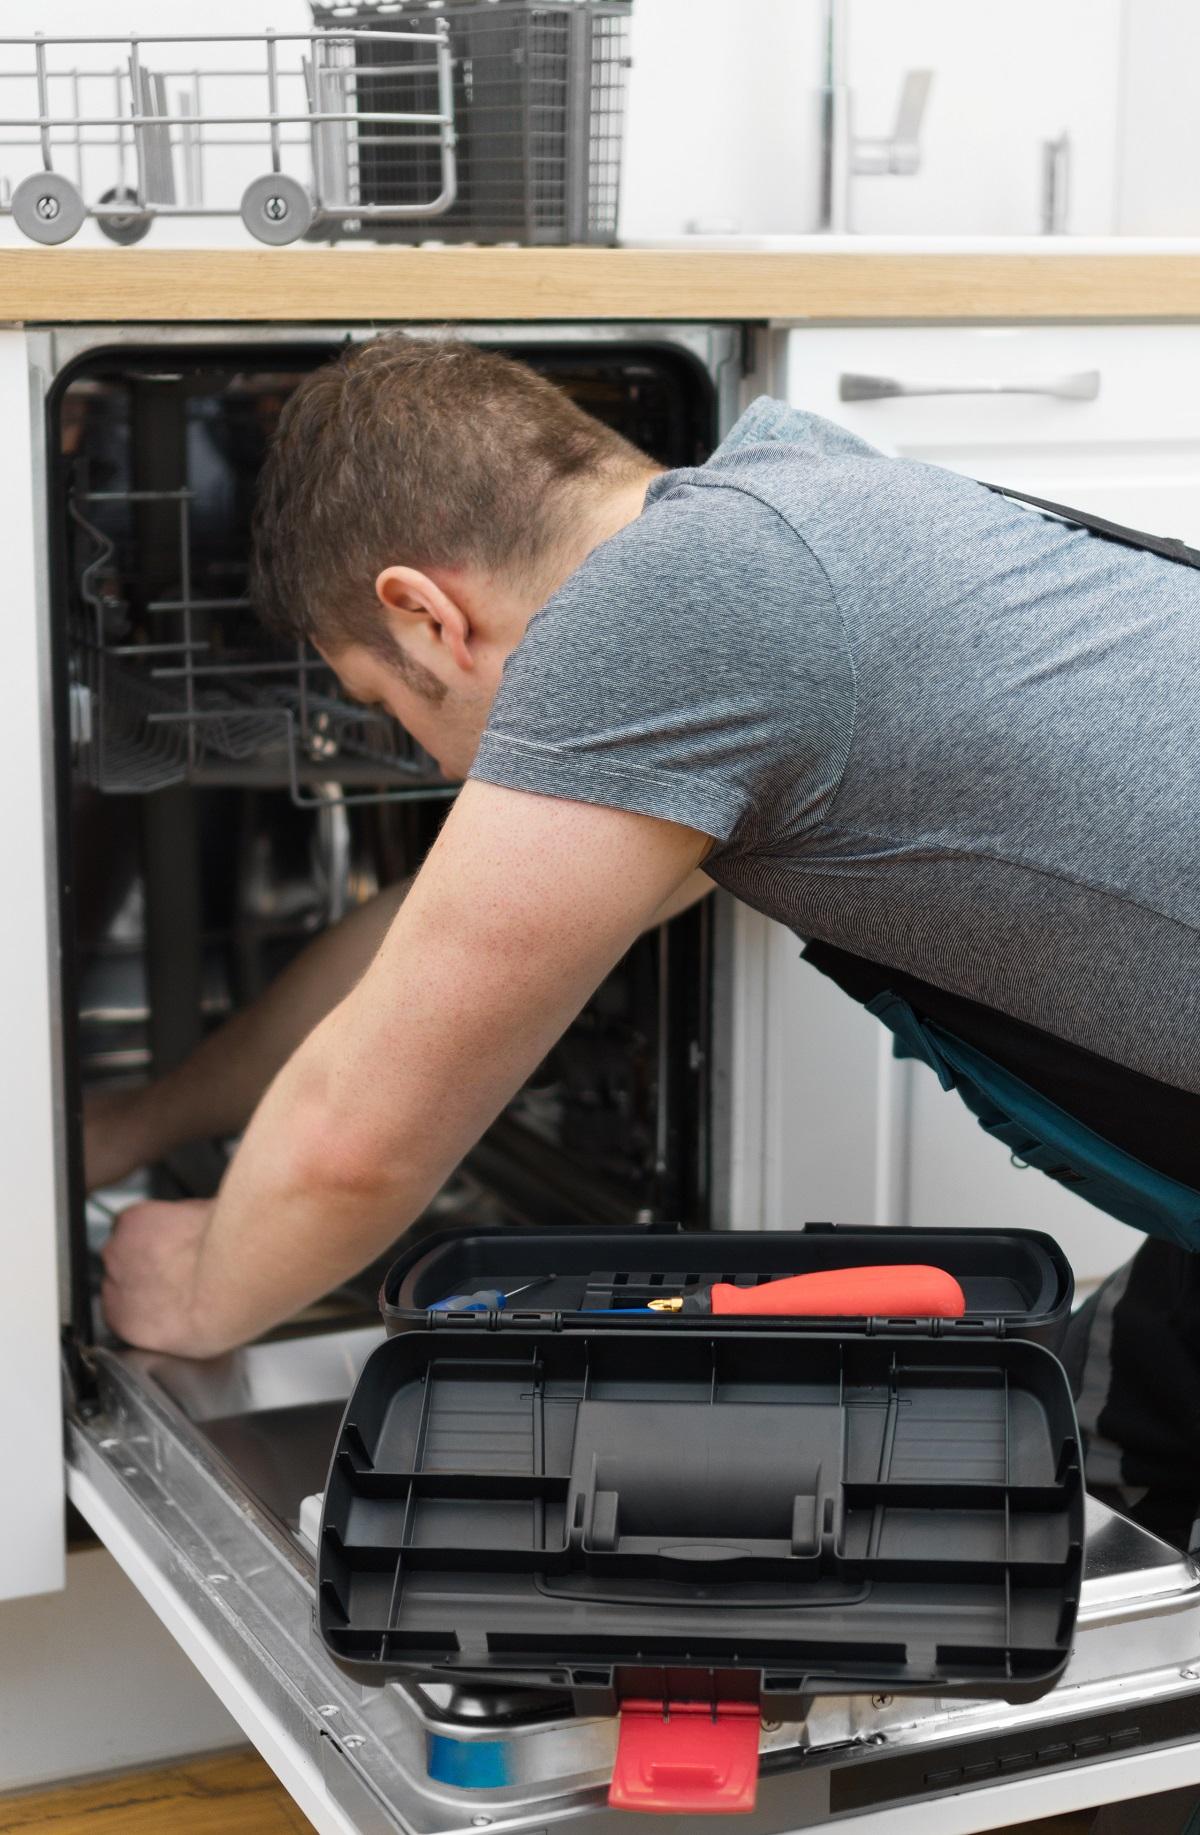 Professional handyman repairing dishwasher in the kitchen